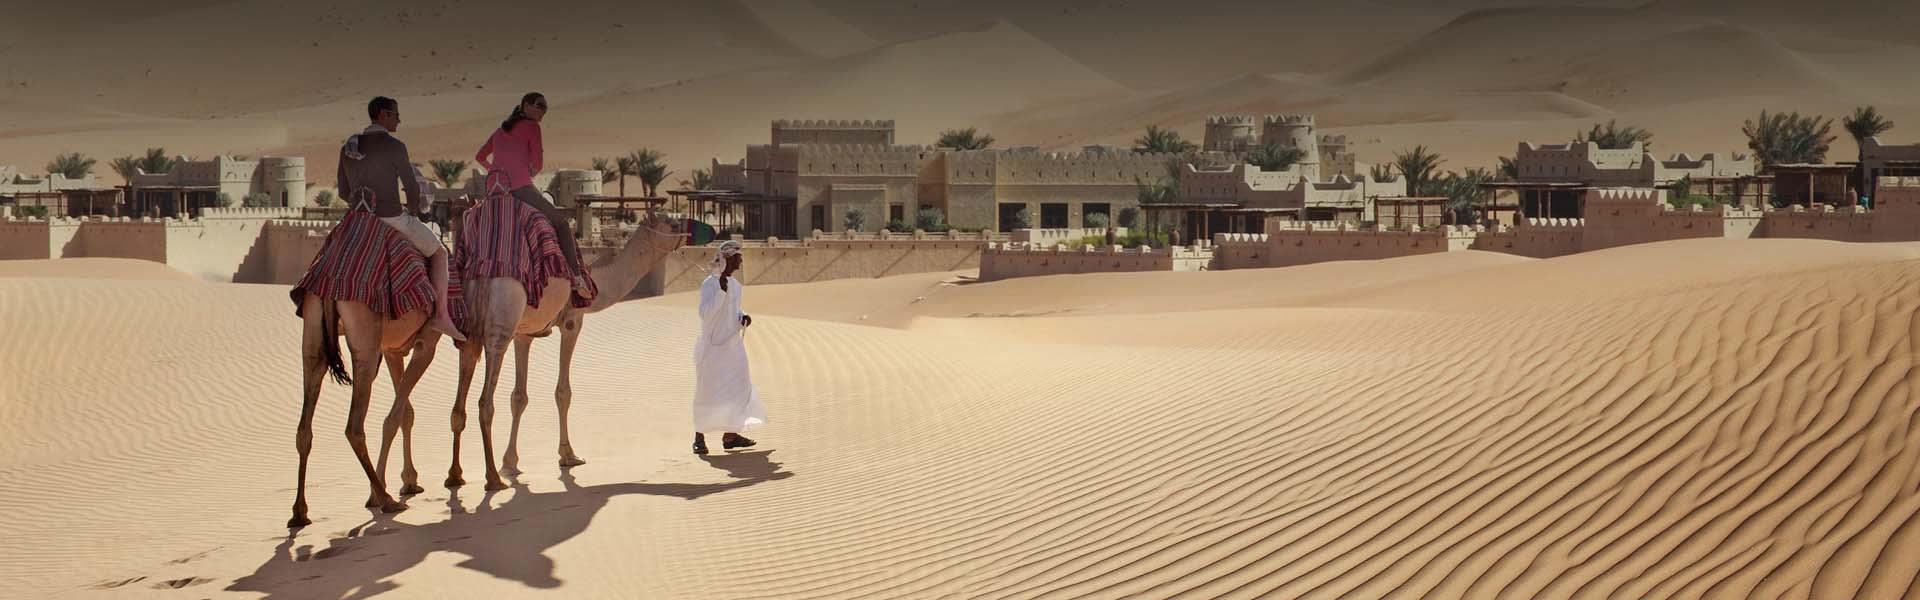 Abu Dhabi Desert Tour | Leisure Activities at Qasr Al Sarab